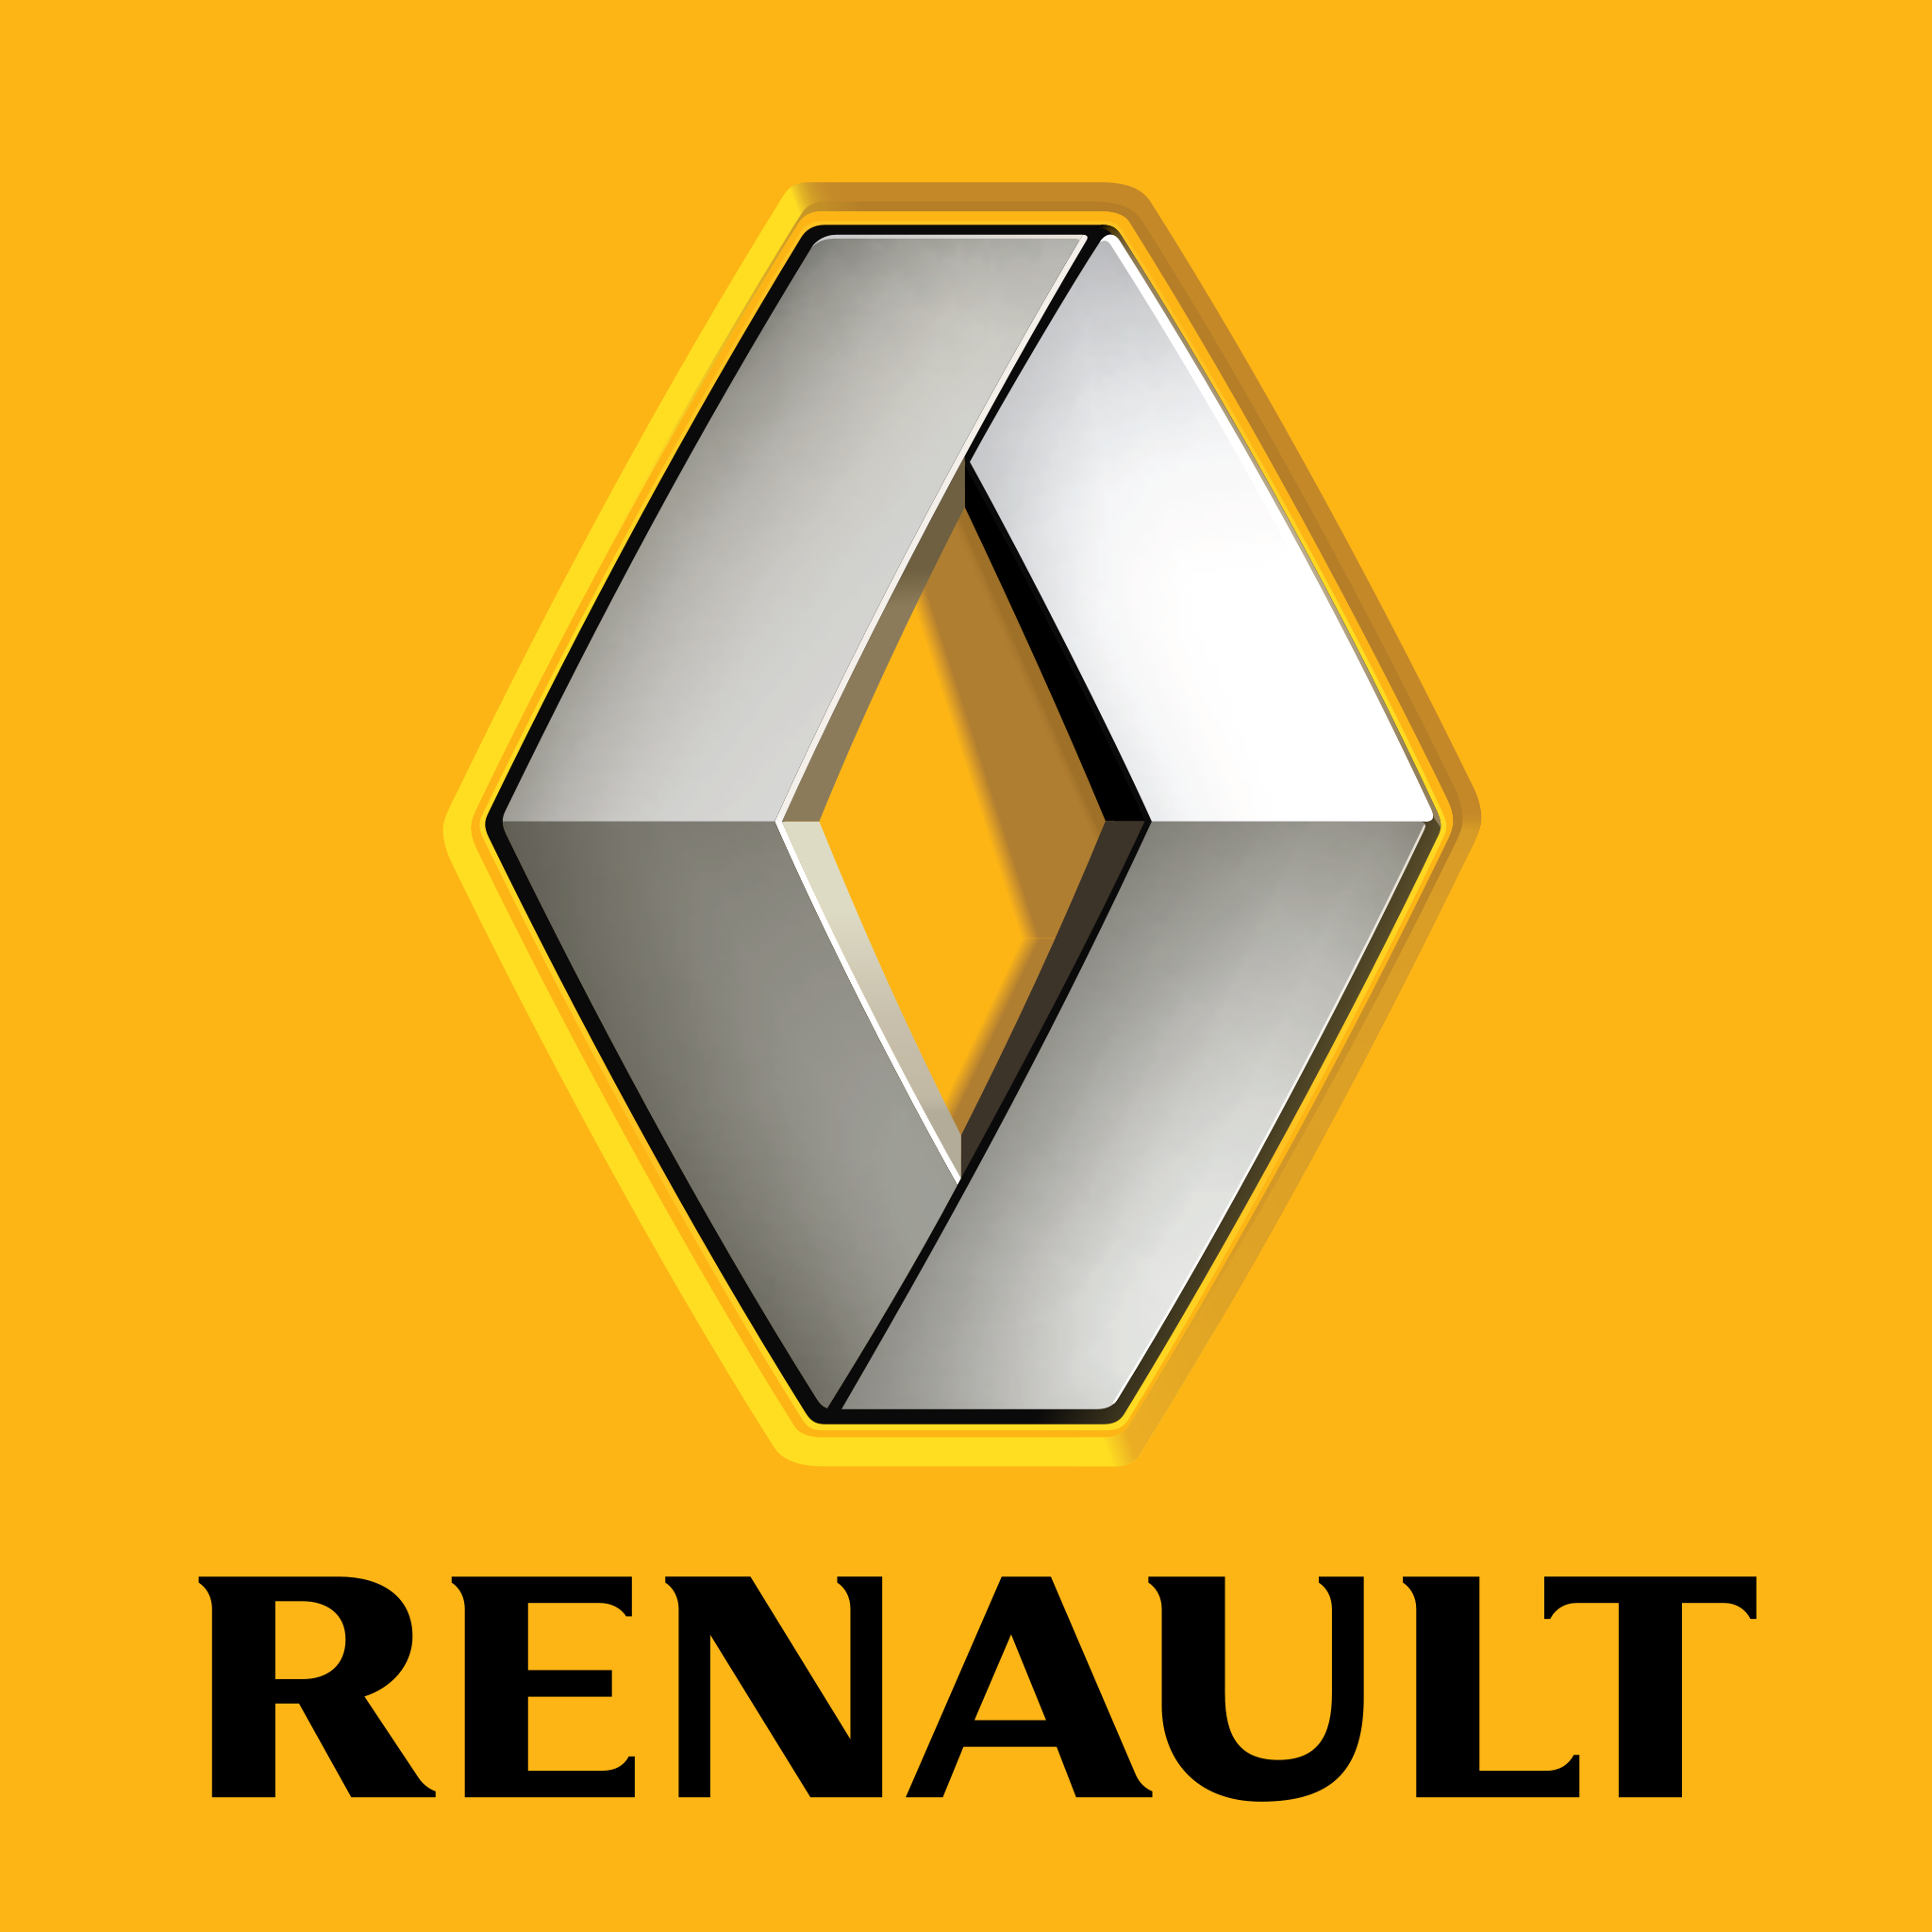 Renault Logo (2007) 2048X2048 Hd Png - Renault, Transparent background PNG HD thumbnail